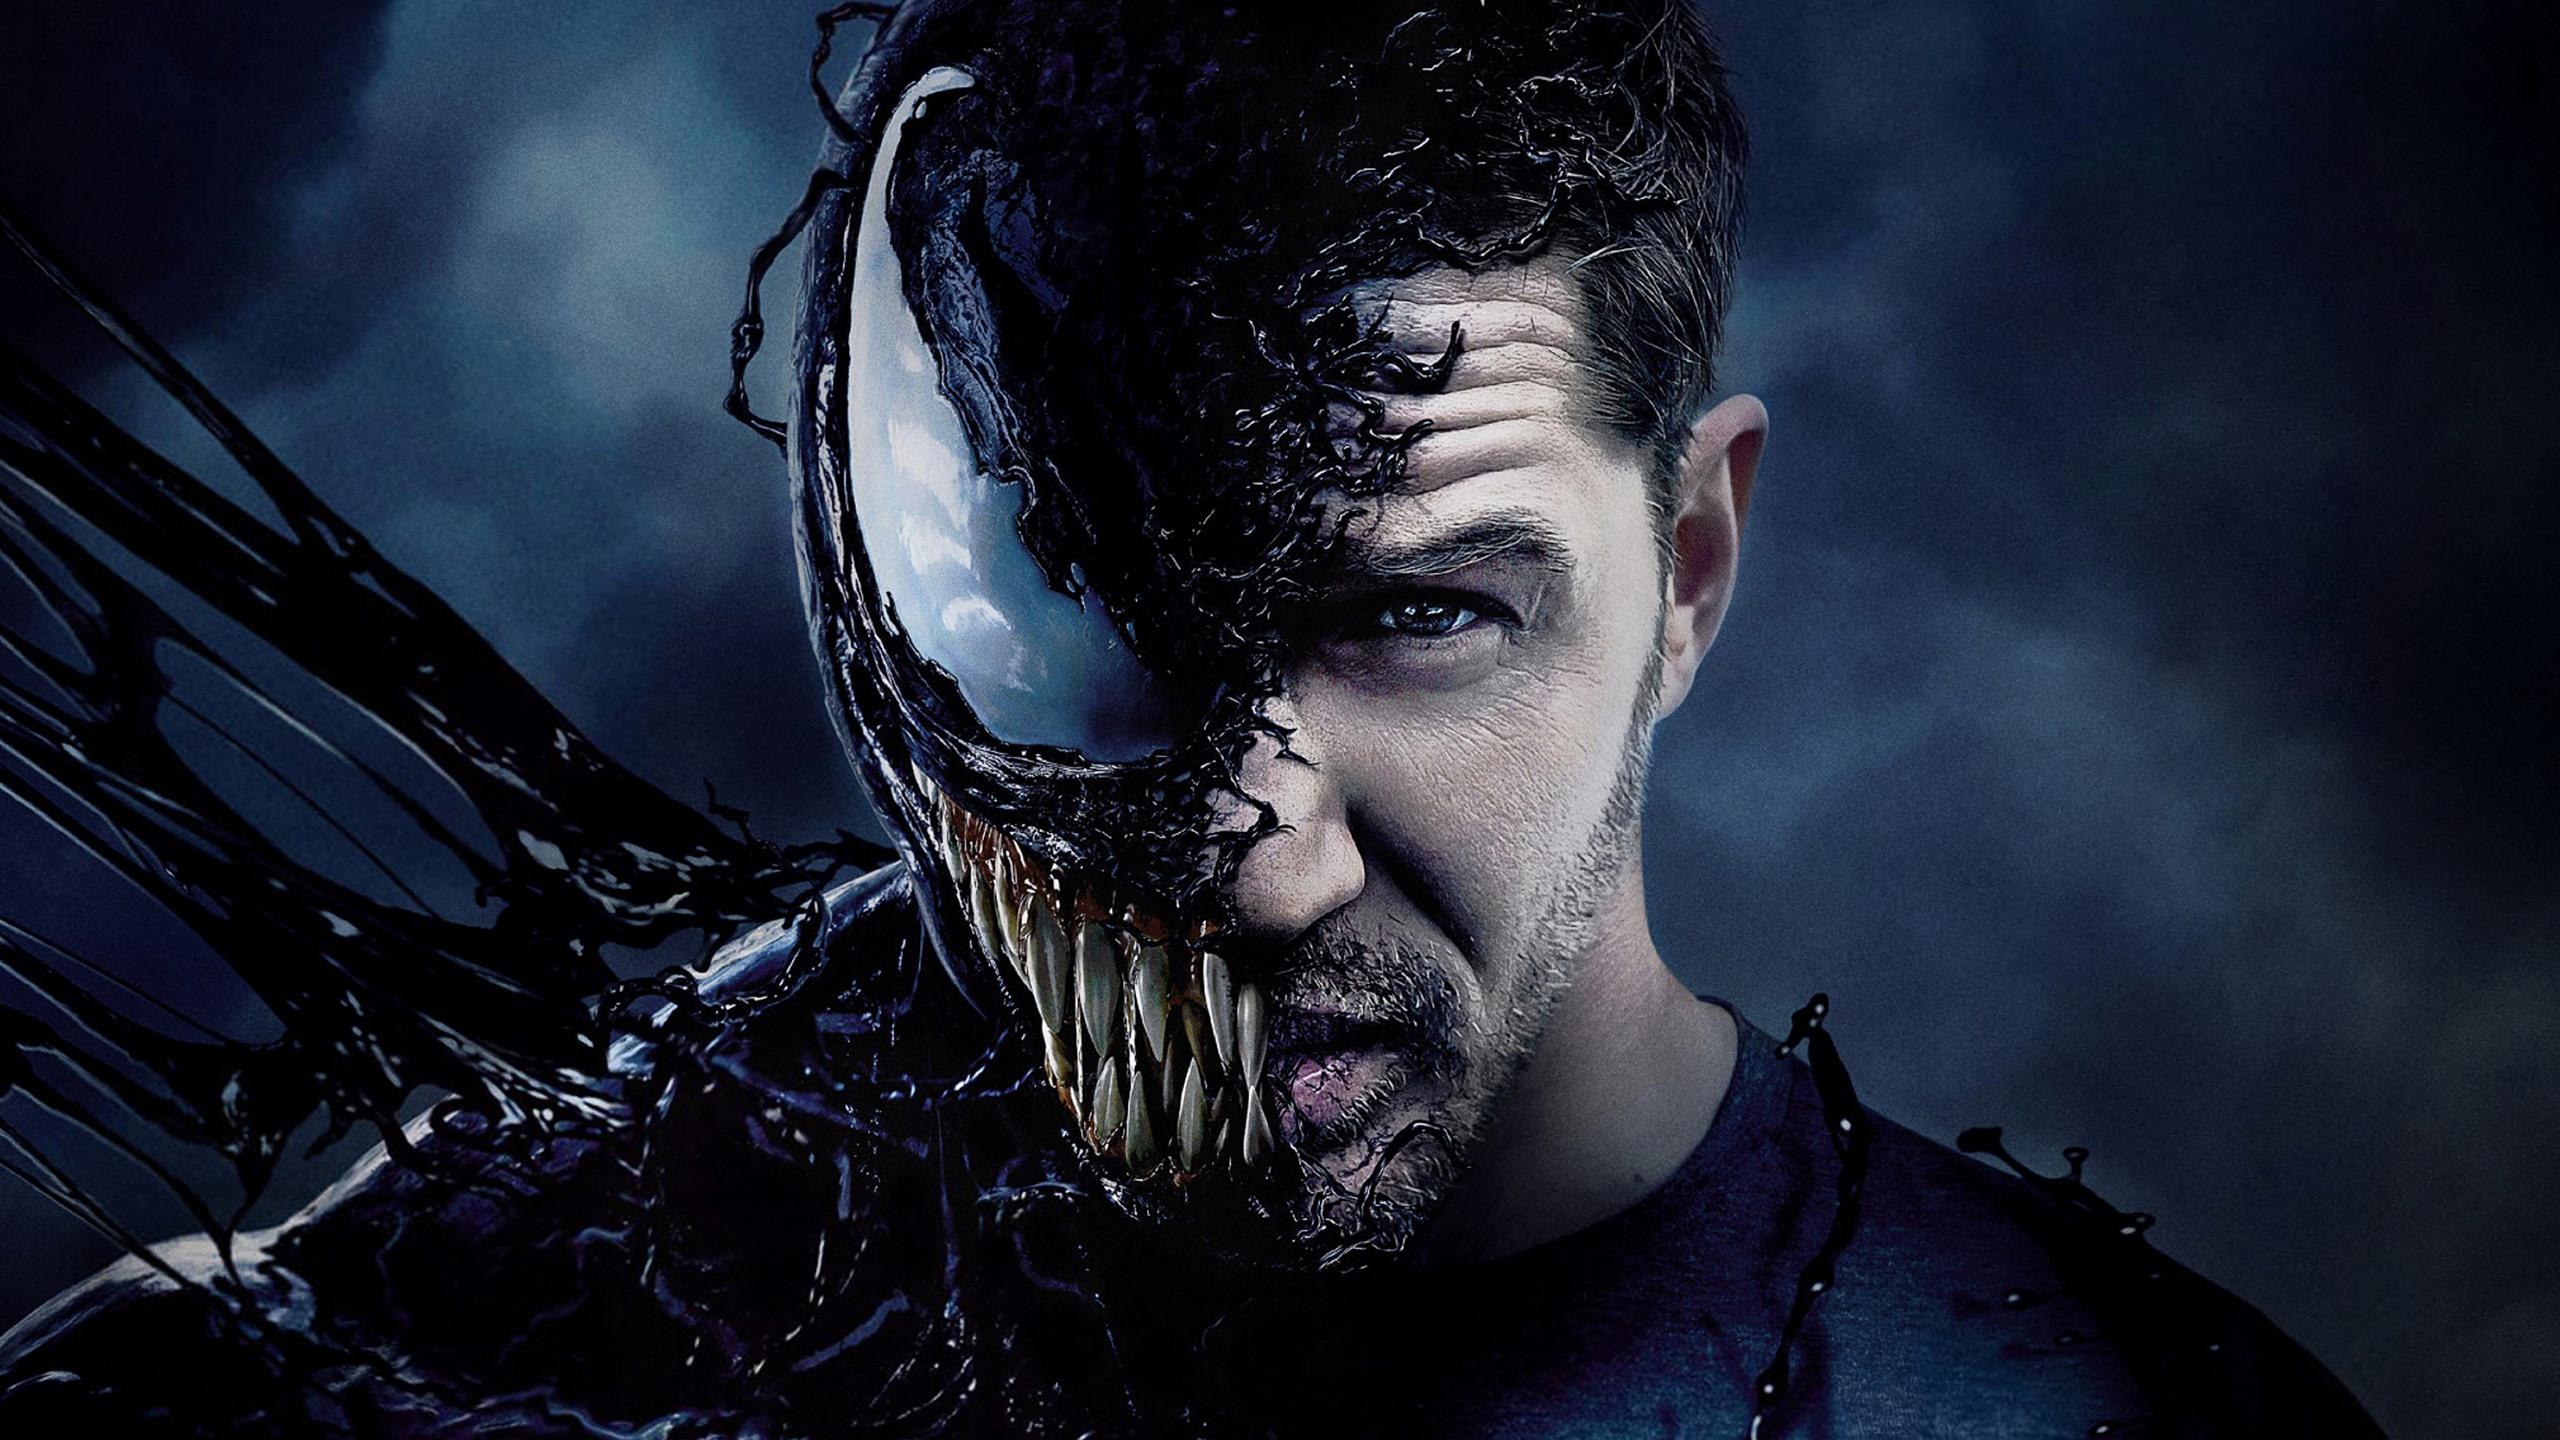 Venom 2018 Full Body Wwwtollebildcom